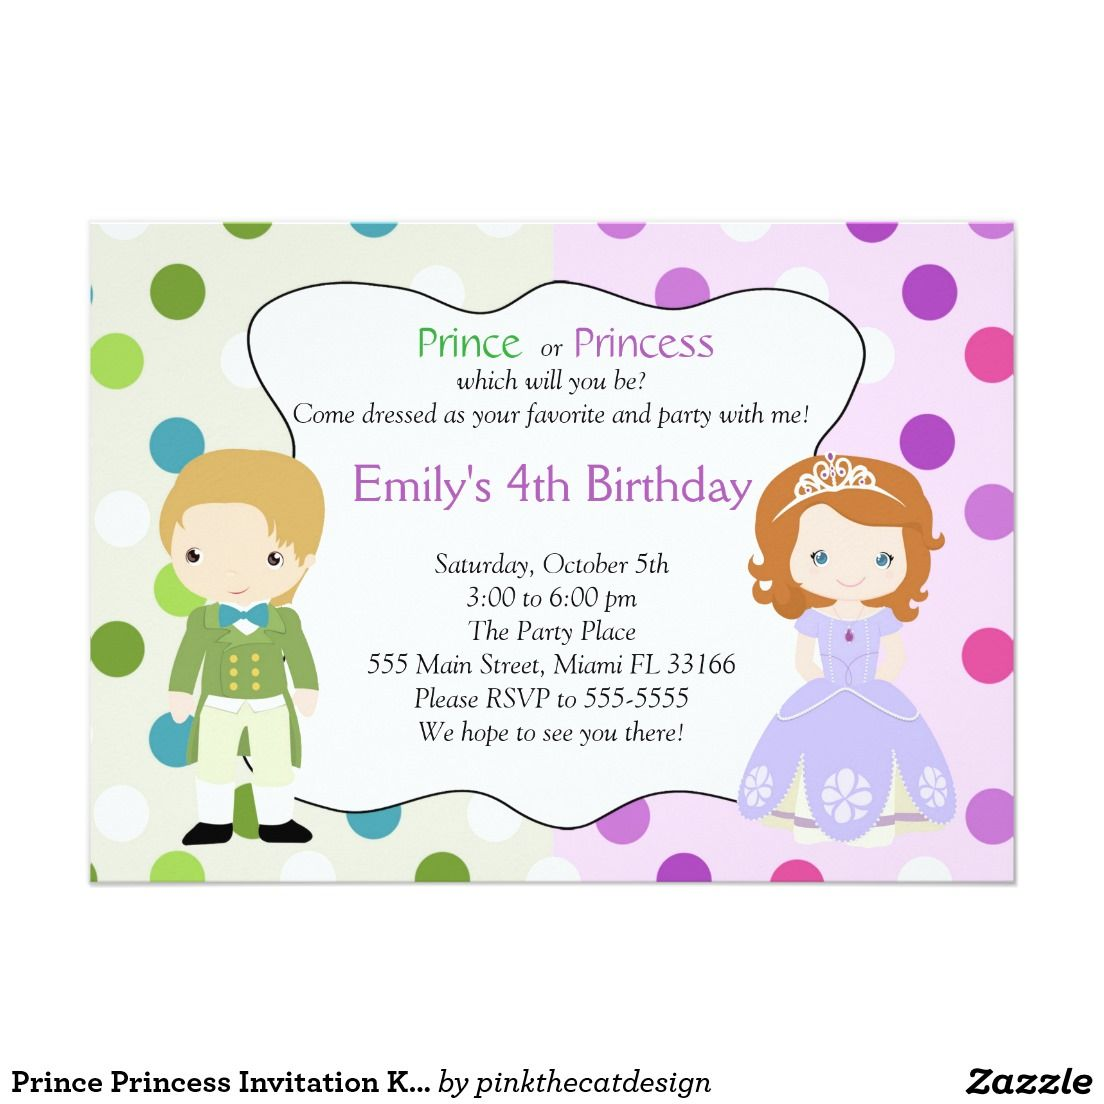 Prince Princess Invitation Kids Birthday Party | Maria Elenas 4th ...